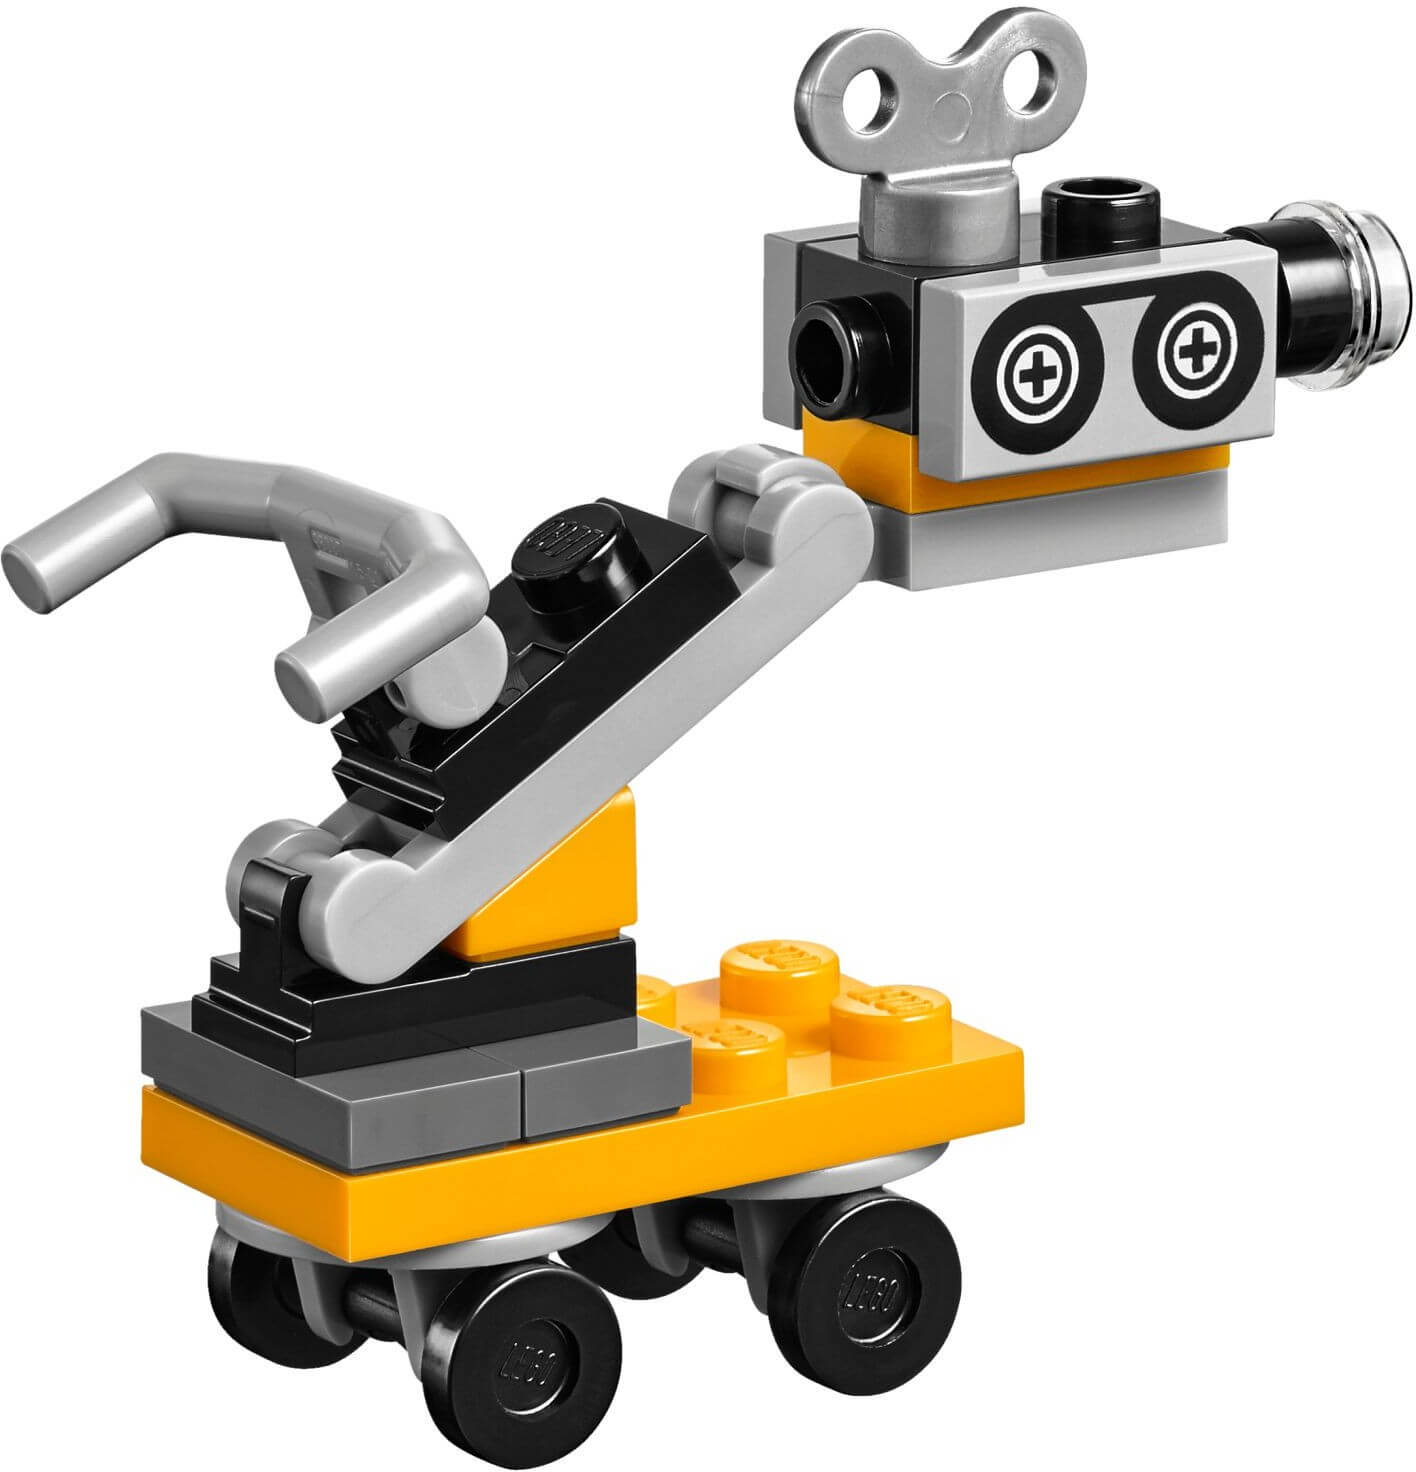 Mua đồ chơi LEGO 41117 - LEGO Friends 41117 - TV Studio của Ngôi Sao Nhạc Pop (LEGO Friends Pop Star TV Studio 41117)